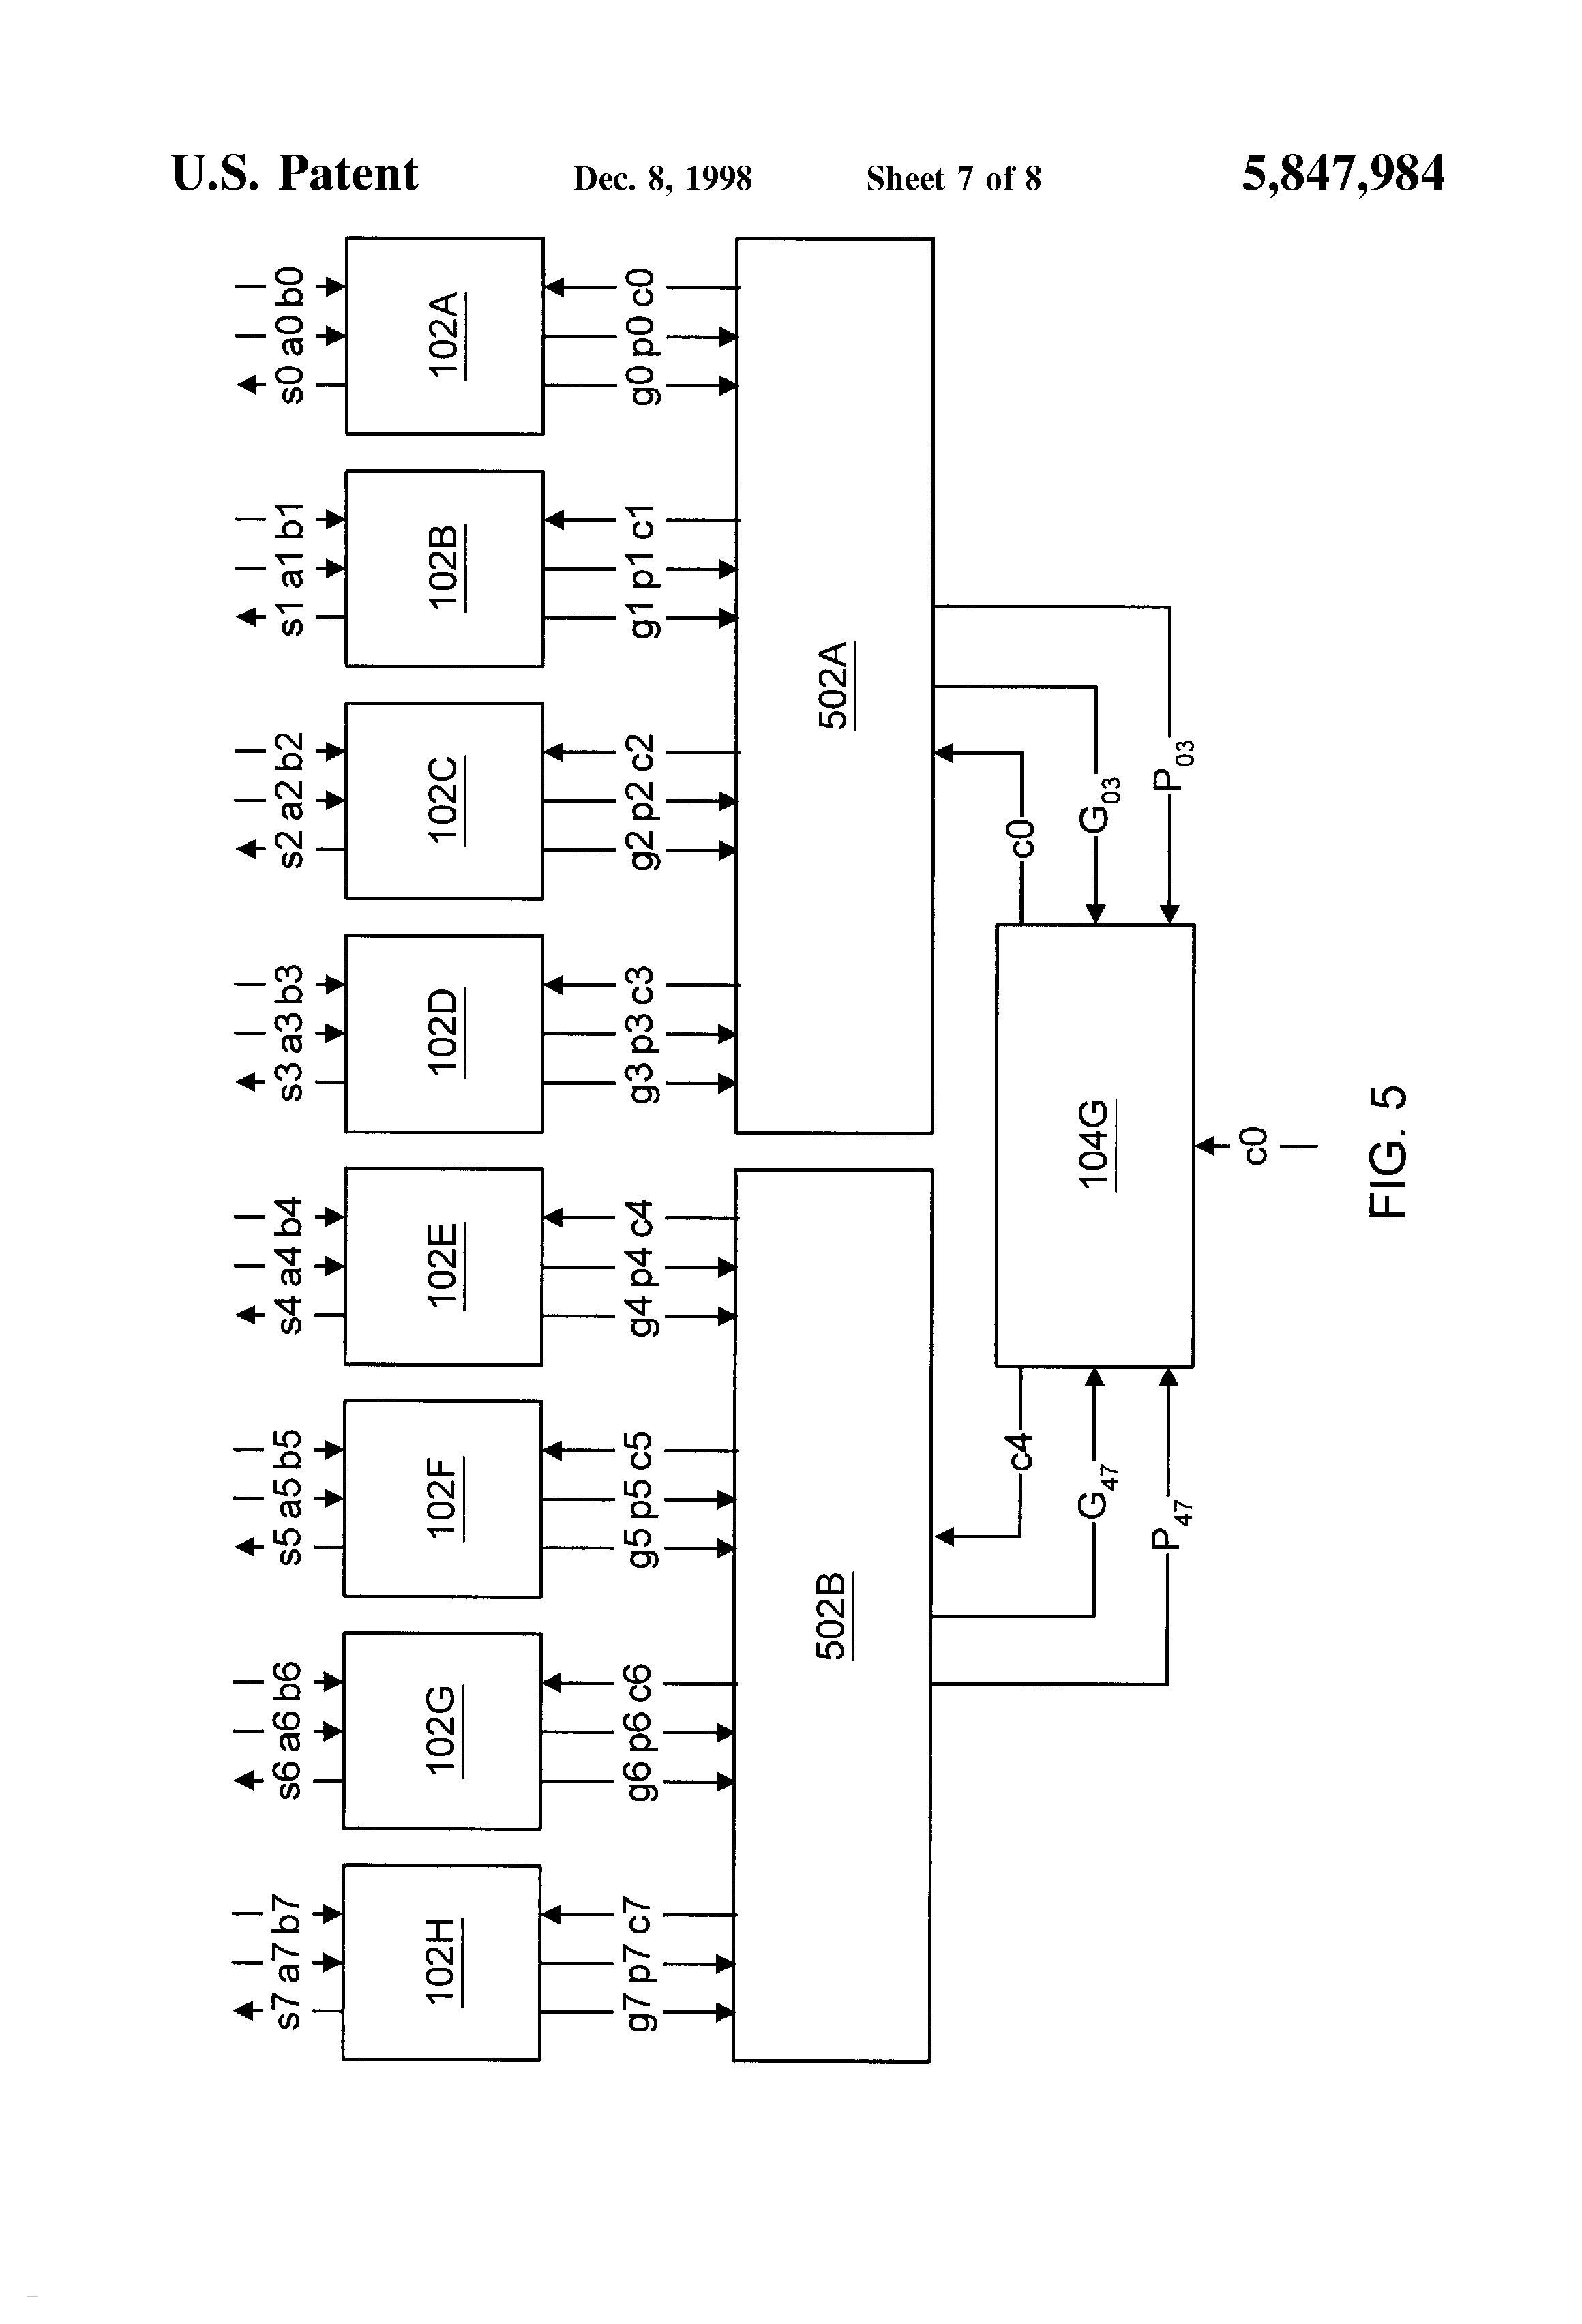 Diagram Circuit New Patent Us Multiplexer Based Parallel N Bit Adder Drawing